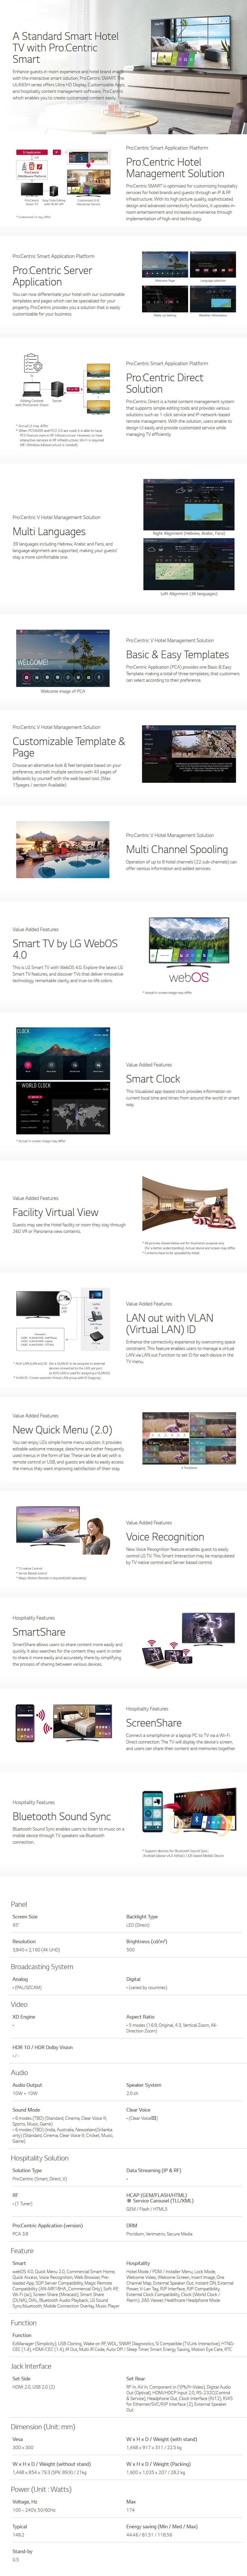 "LG 55UU665H 55"" 4K UHD TV ProCentric Commercial TV - Desktop Overview 1"